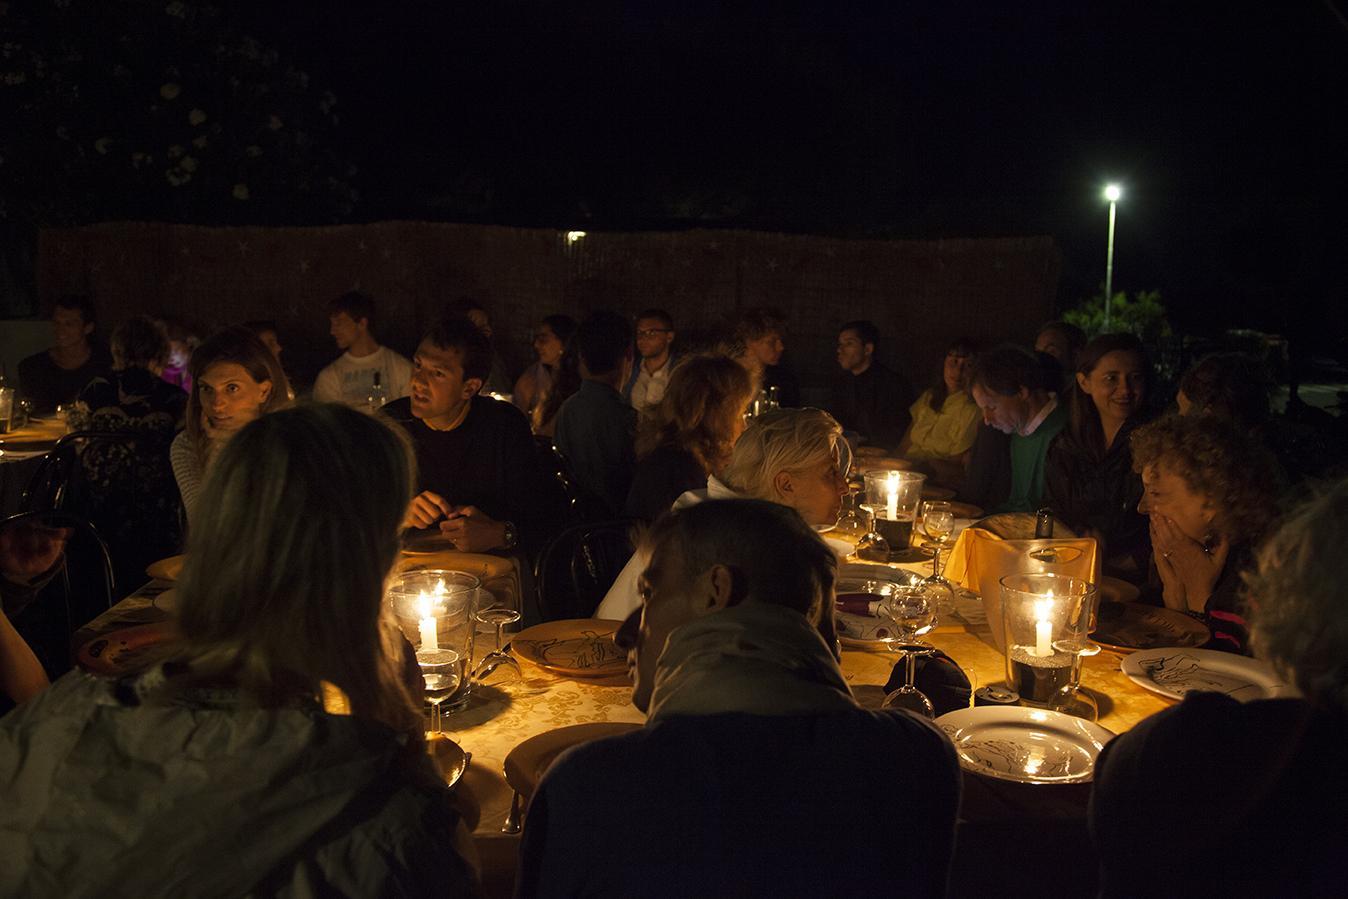 Dinner at Zurro at the opening night Photo:Giovanna Silva Courtesy Fiorucci Art Trust, London